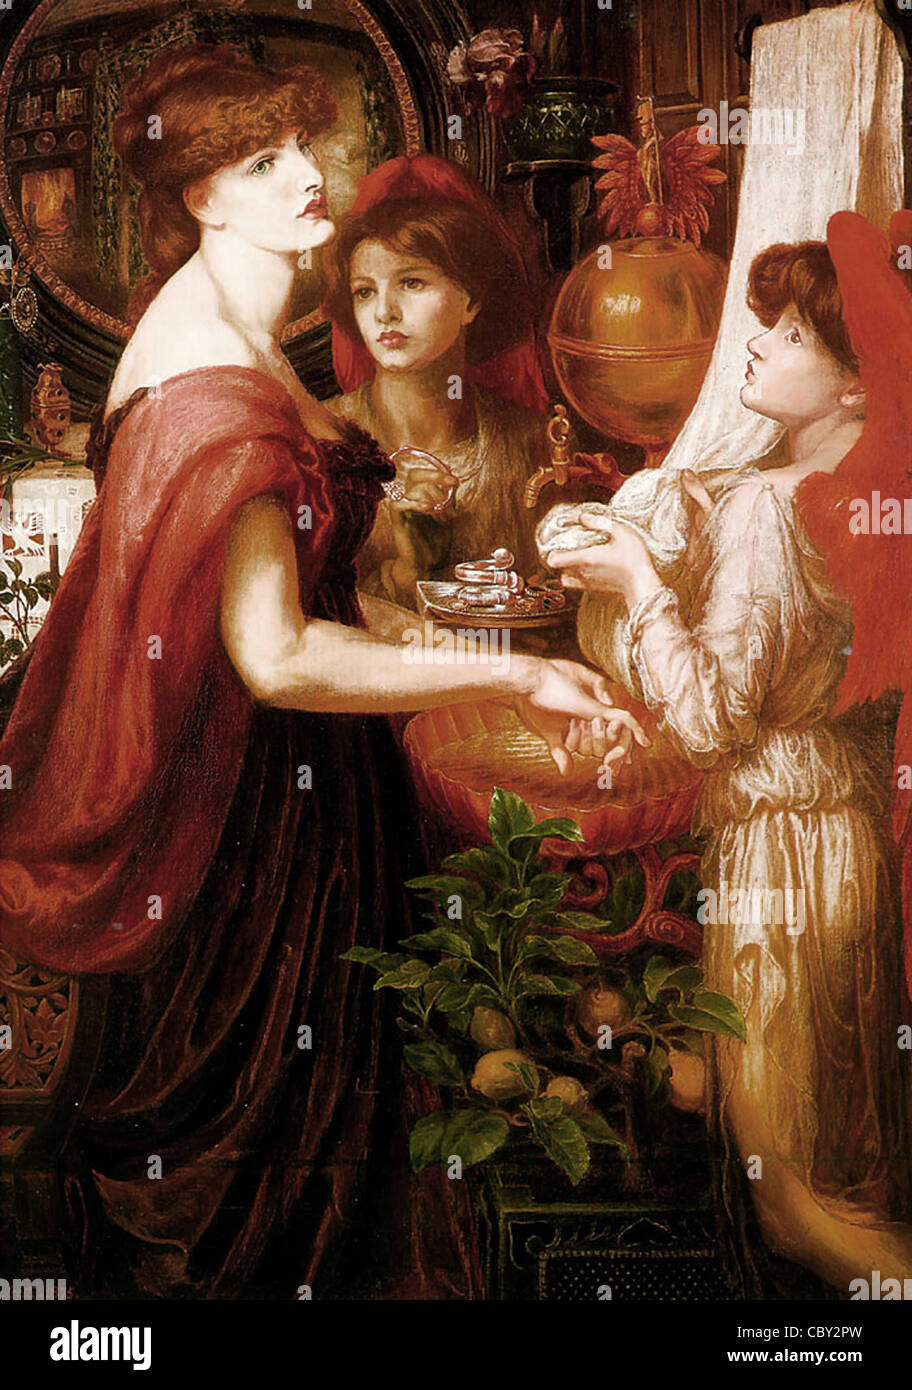 Dante Gabriel Rossetti La Bella Mano Imagen De Stock